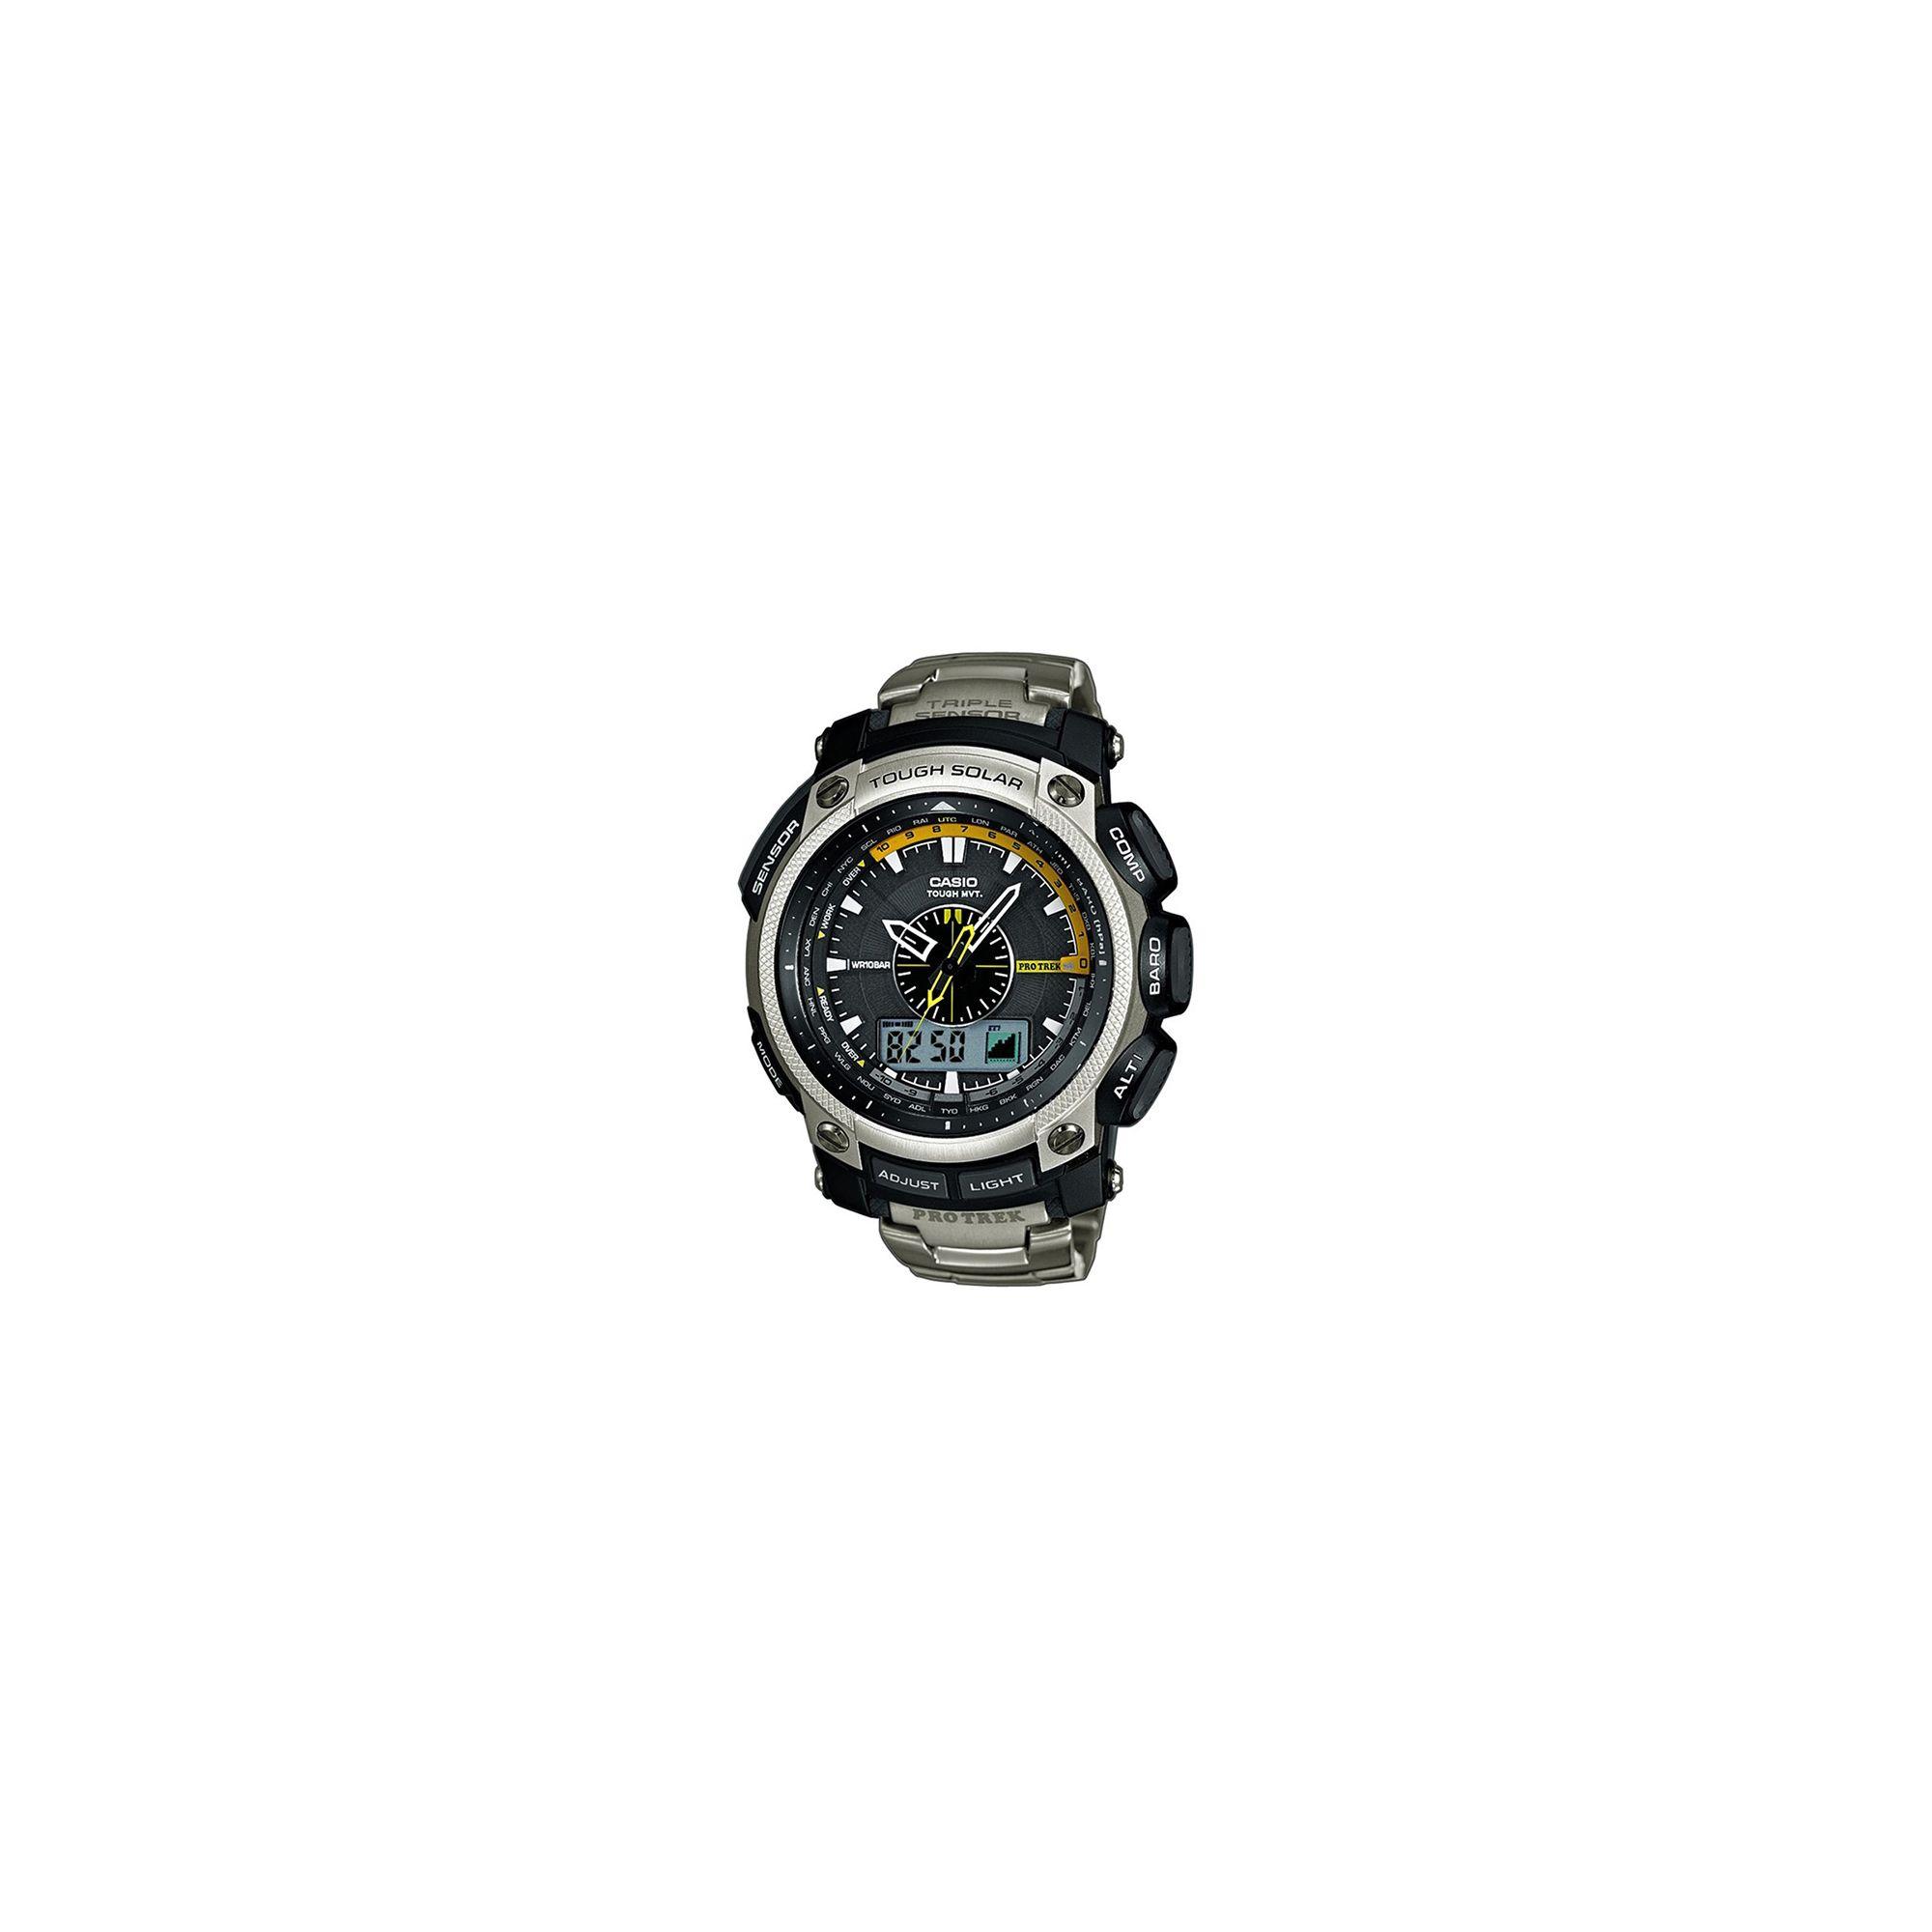 Casio PRW5000T-7E Protrek Radio Controlled Watch at Tesco Direct